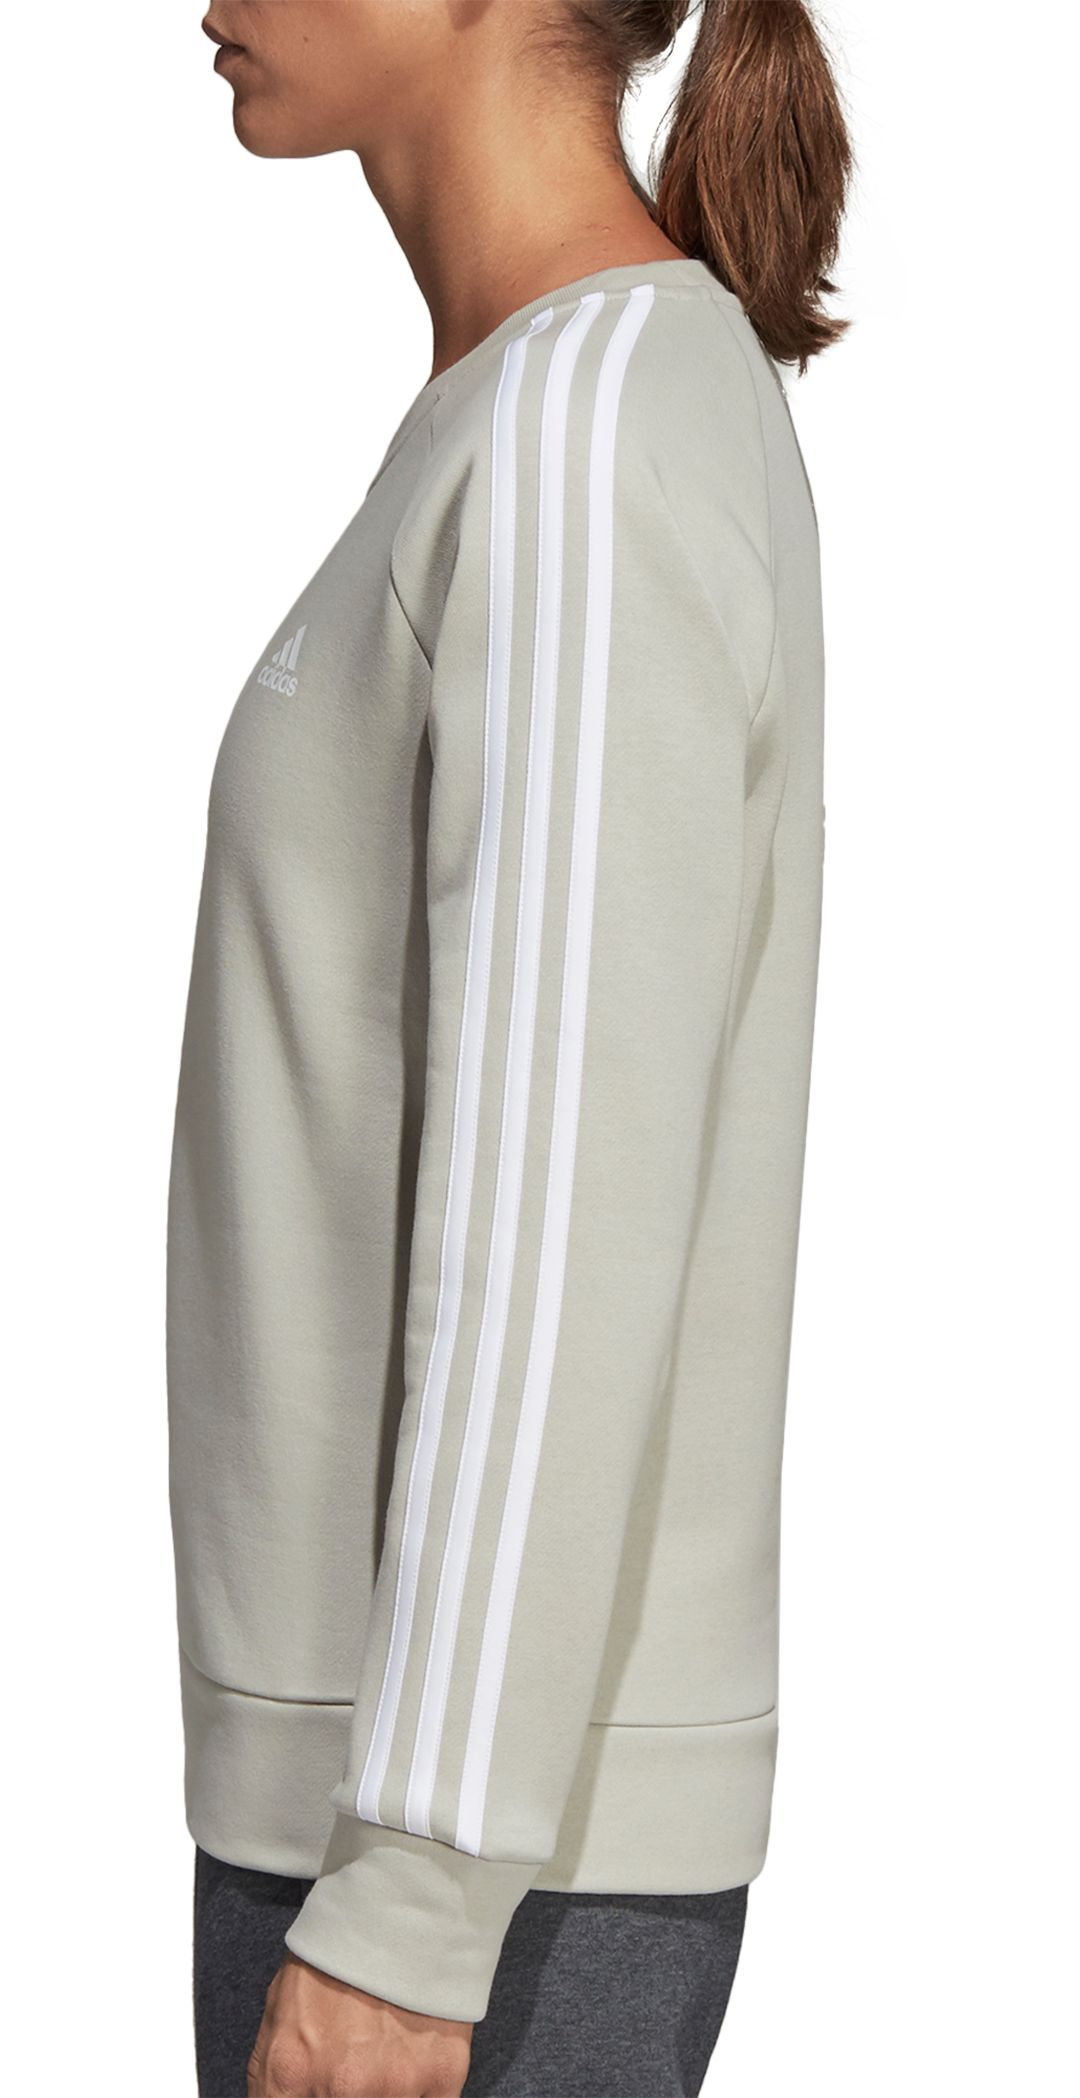 f9fd20b74d6a adidas Women's Essentials 3-Stripes Crewneck Sweatshirt. noImageFound.  Previous. 1. 2. 3